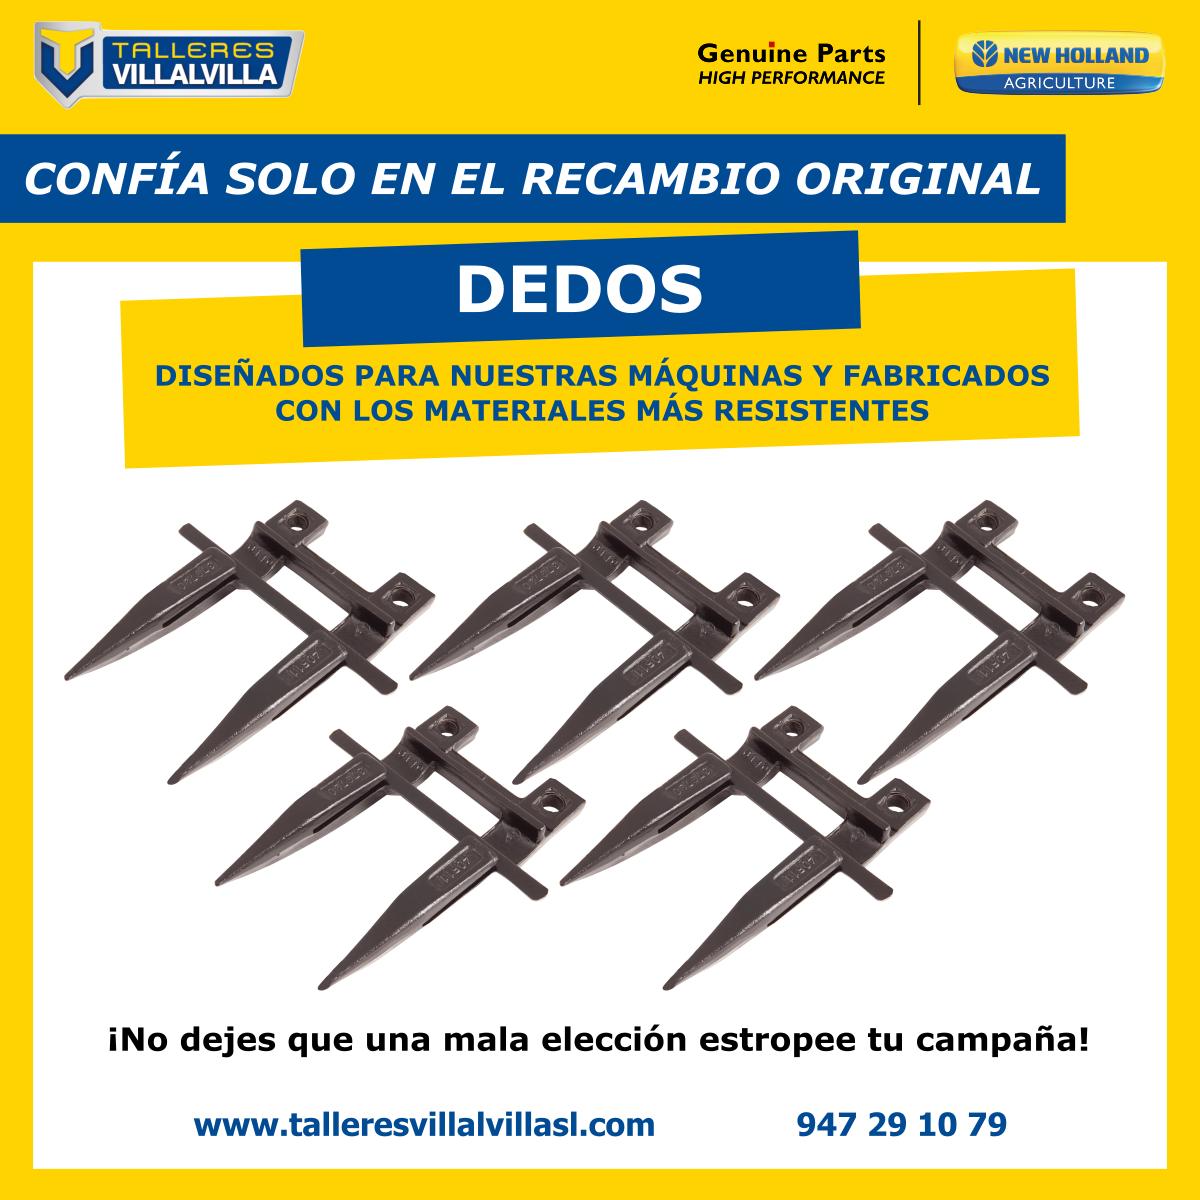 RECAMBIO ORIGINAL – DEDOS DE CORTE